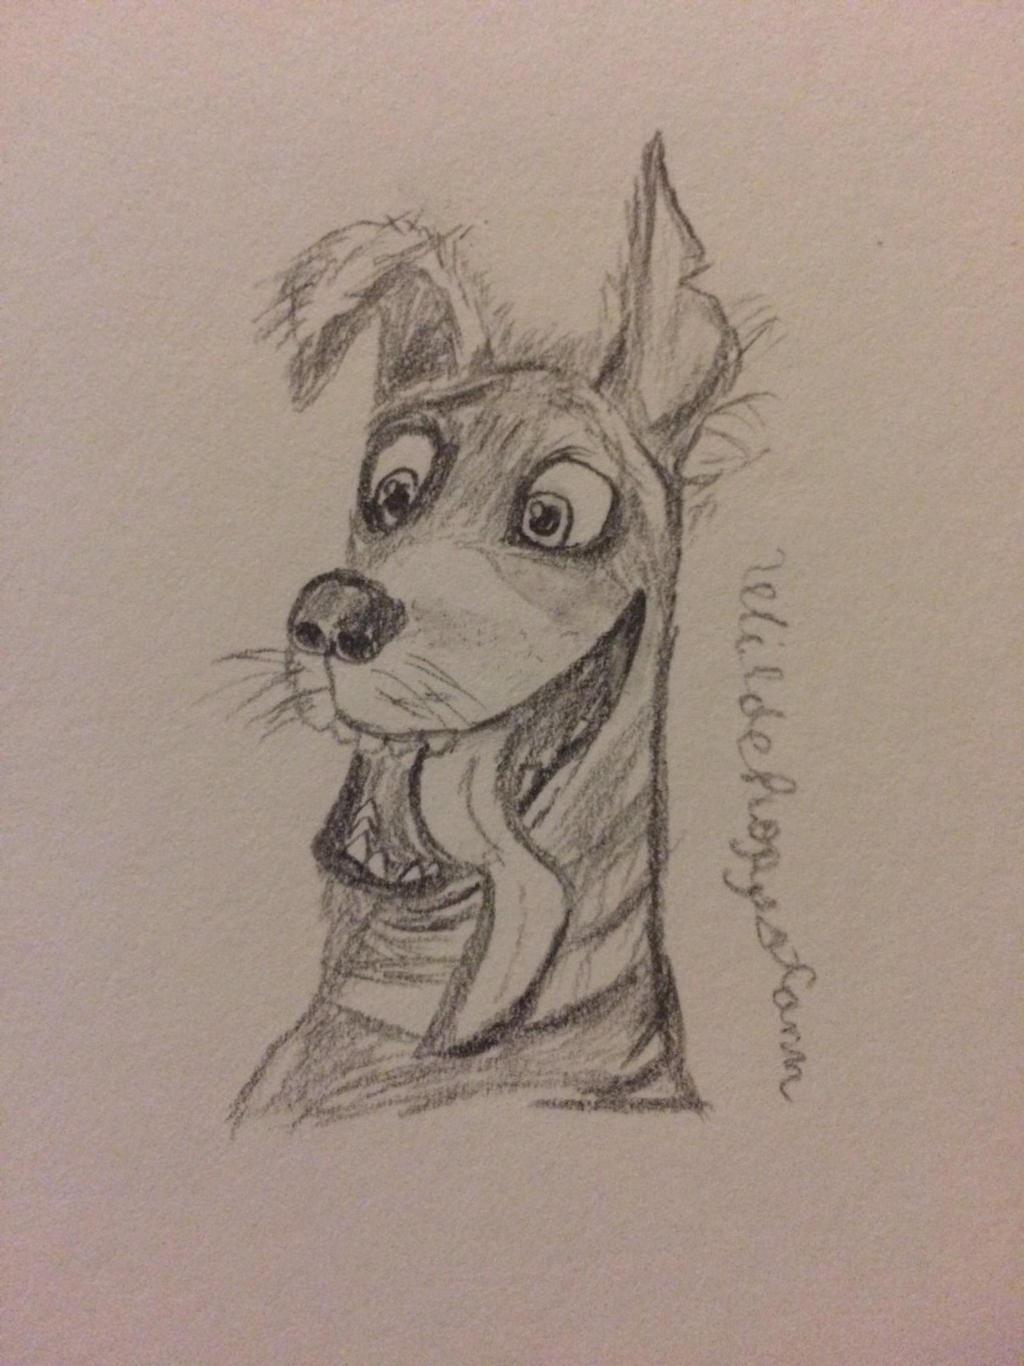 Dante From Pixar S Coco By Wildehoppsfann On Deviantart